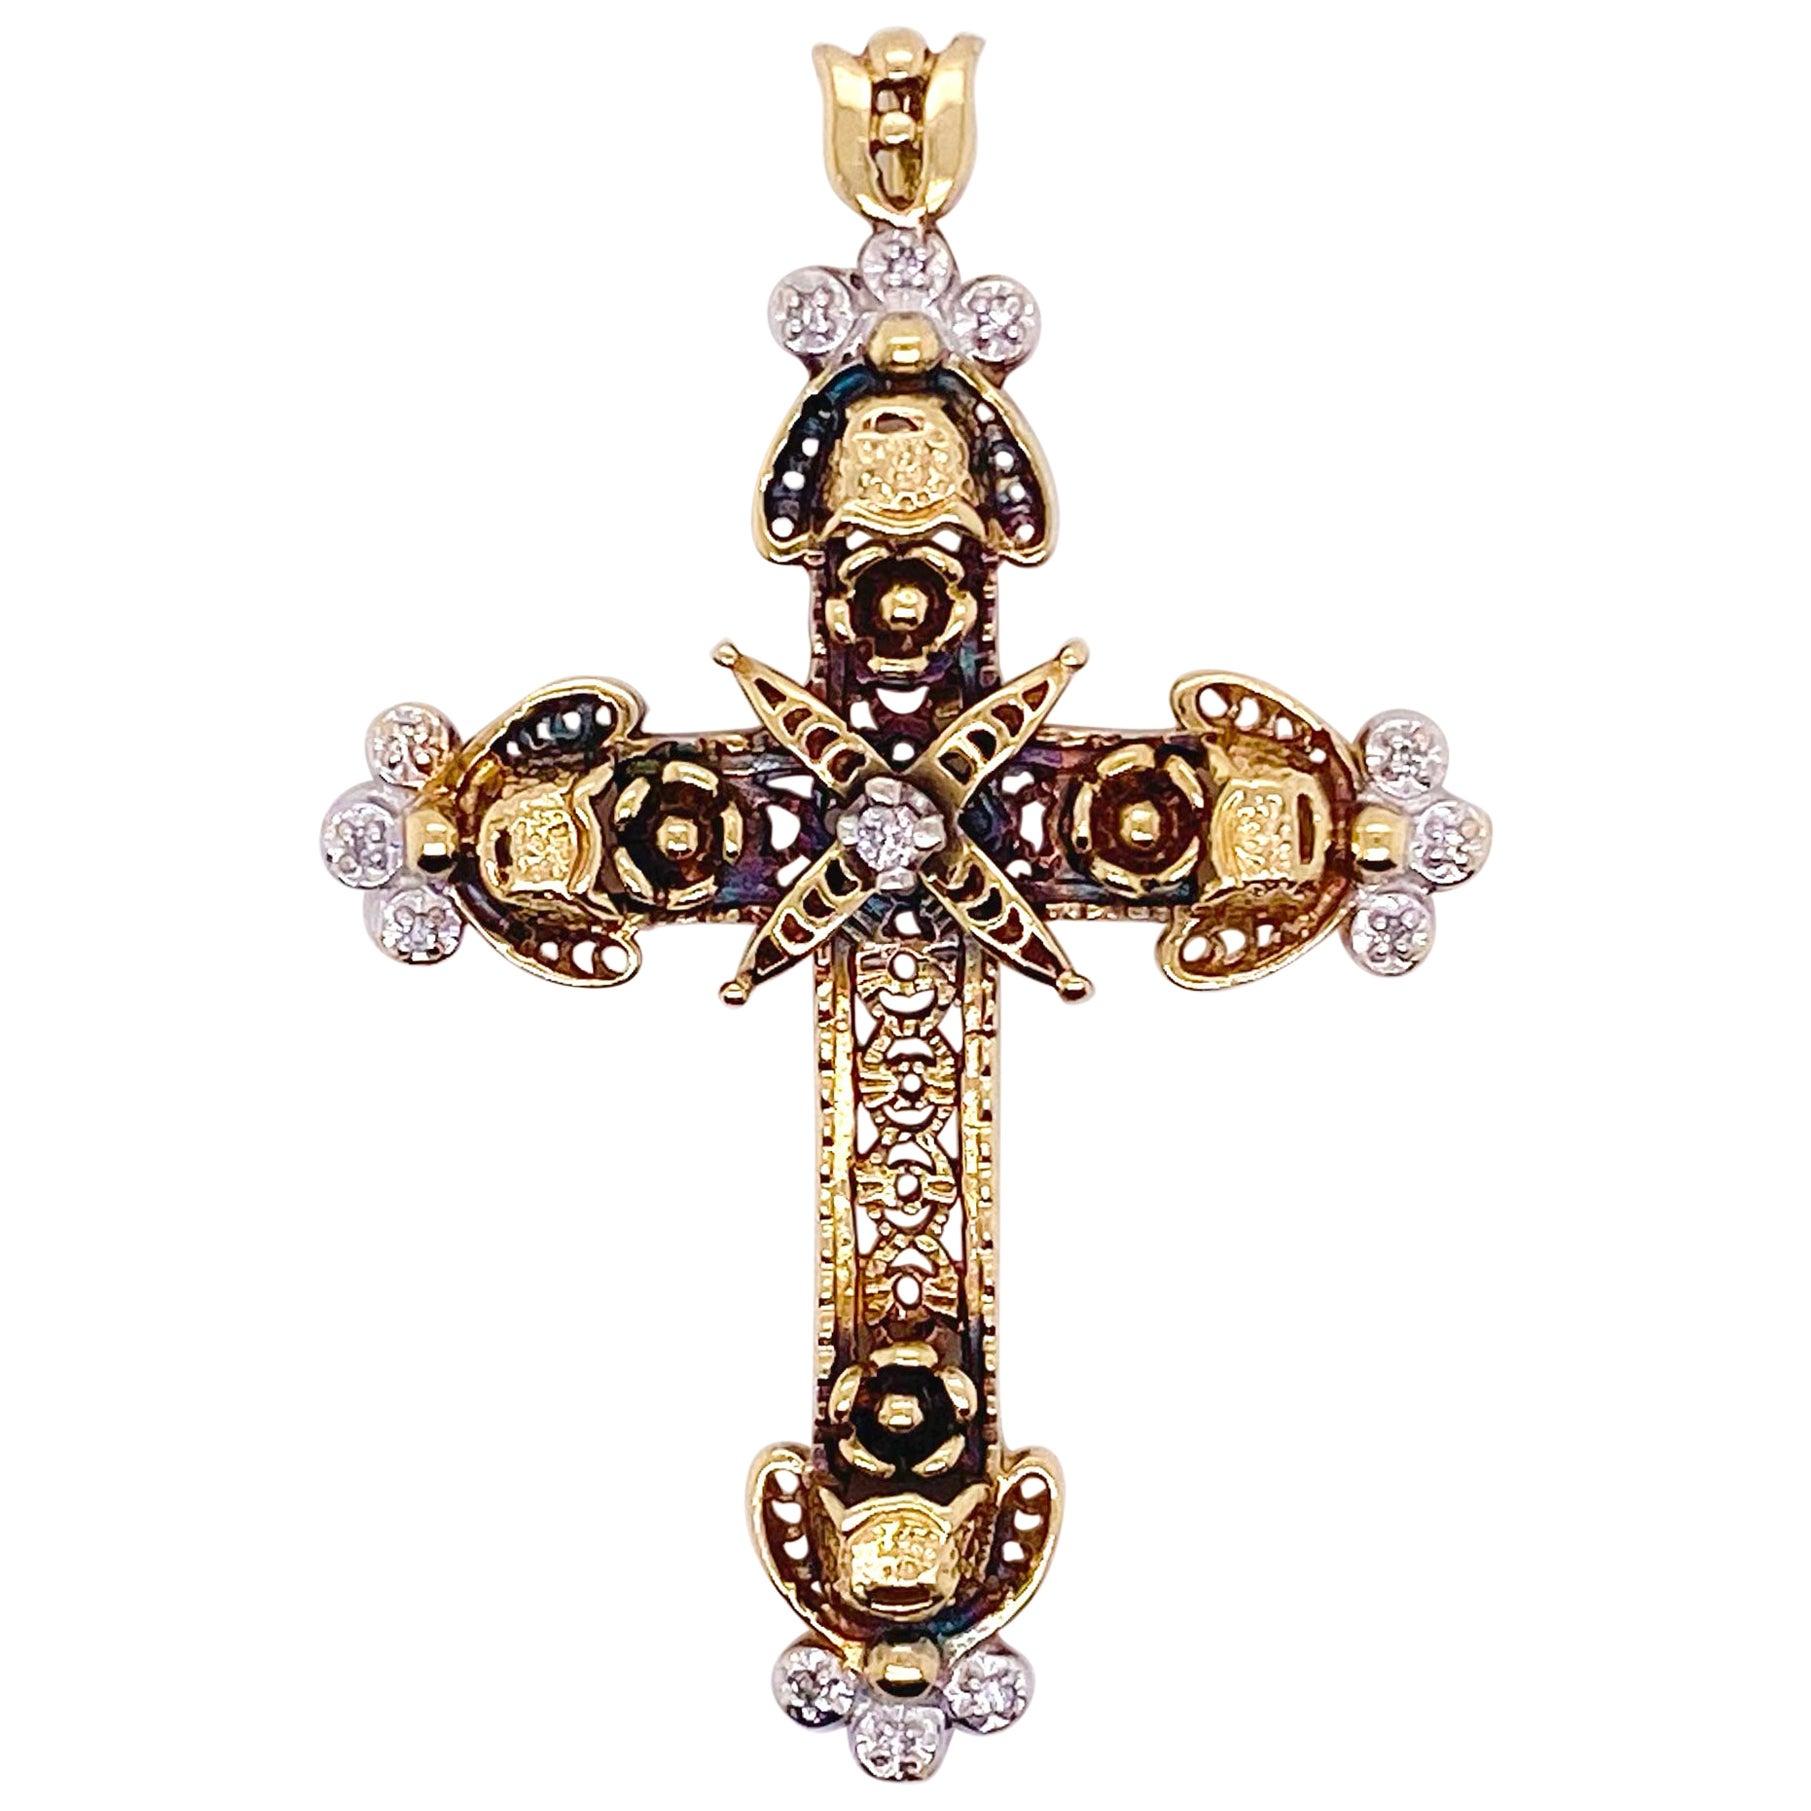 Diamond Cross Pendant, 14 Karat Yellow Gold, Charm